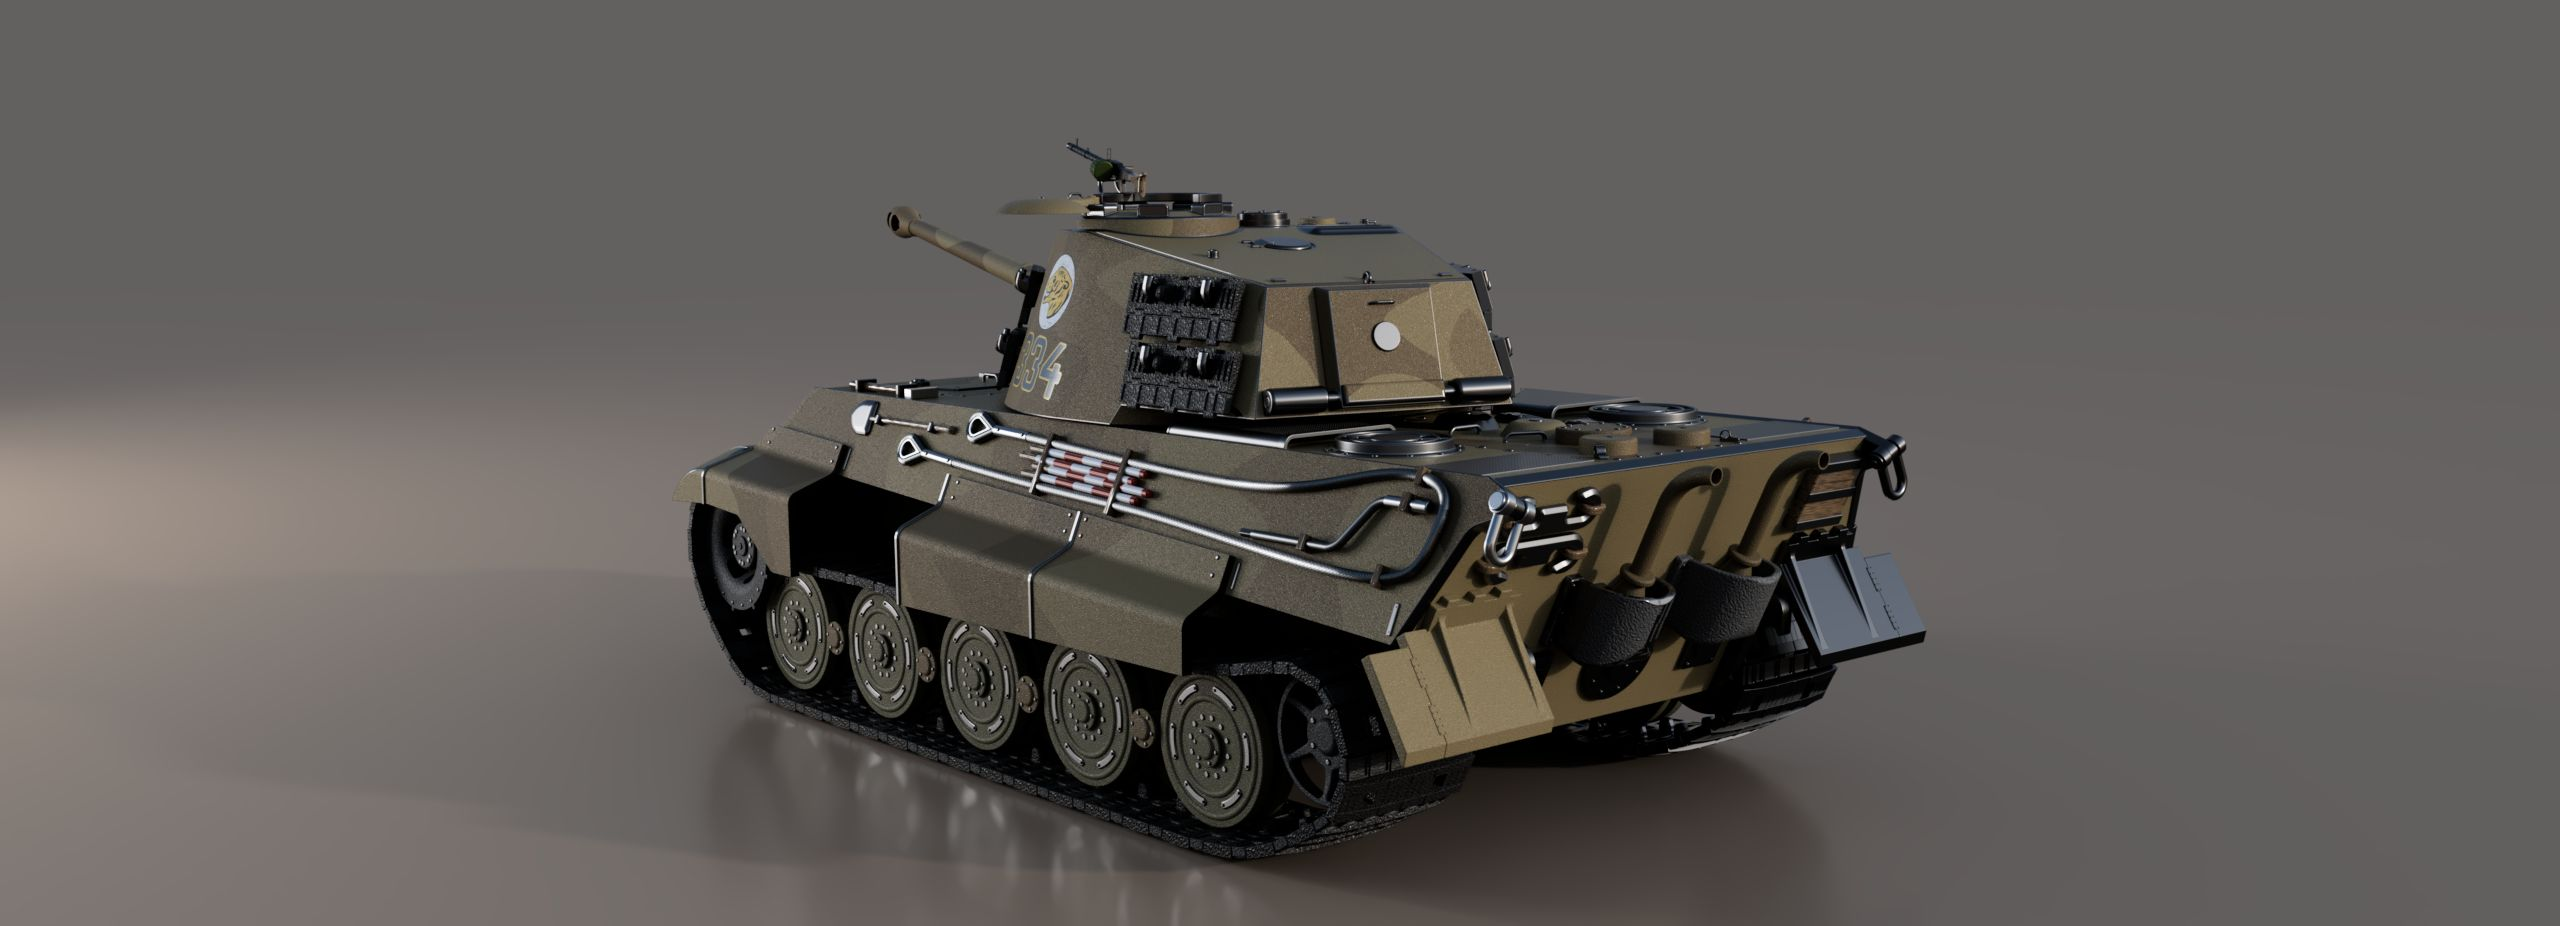 Tiger-ii-komplett-wuste-2018-sep-20-08-14-43am-000-customizedview14532376325-png-3500-3500